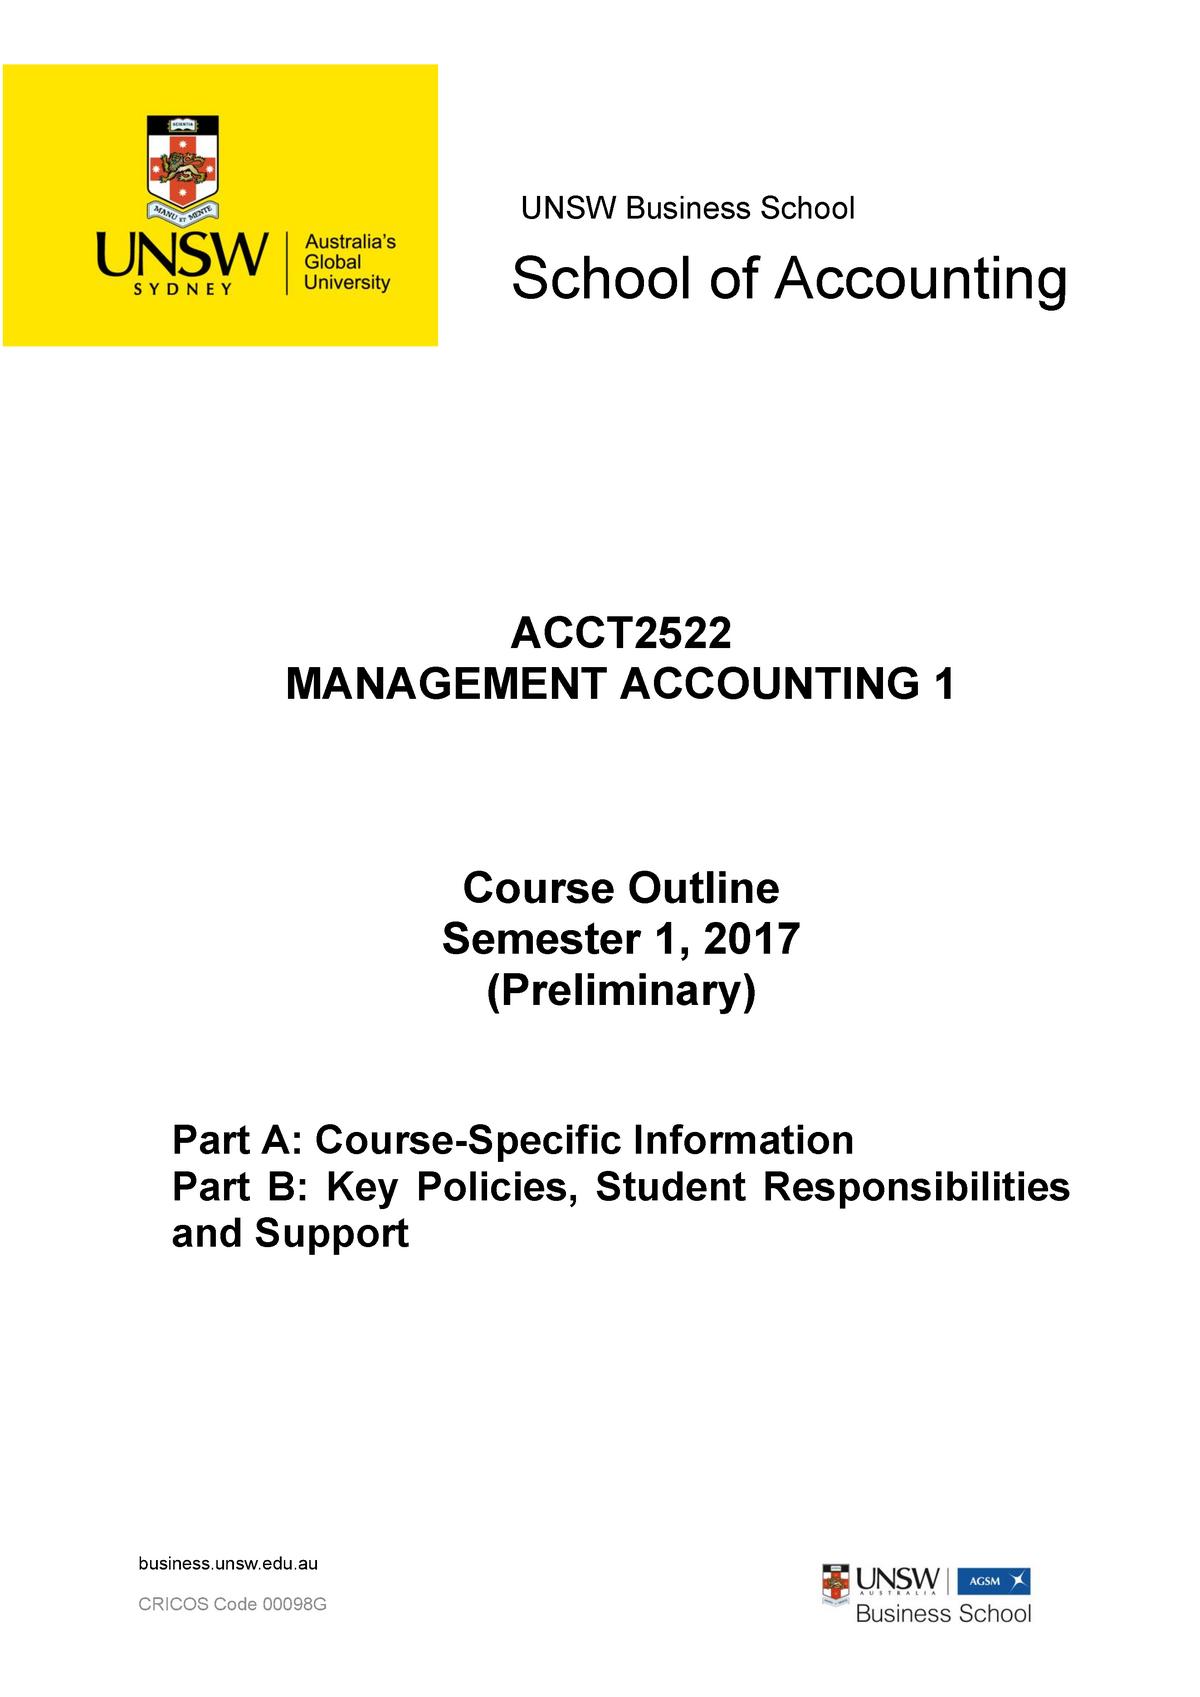 acct3563 course outline